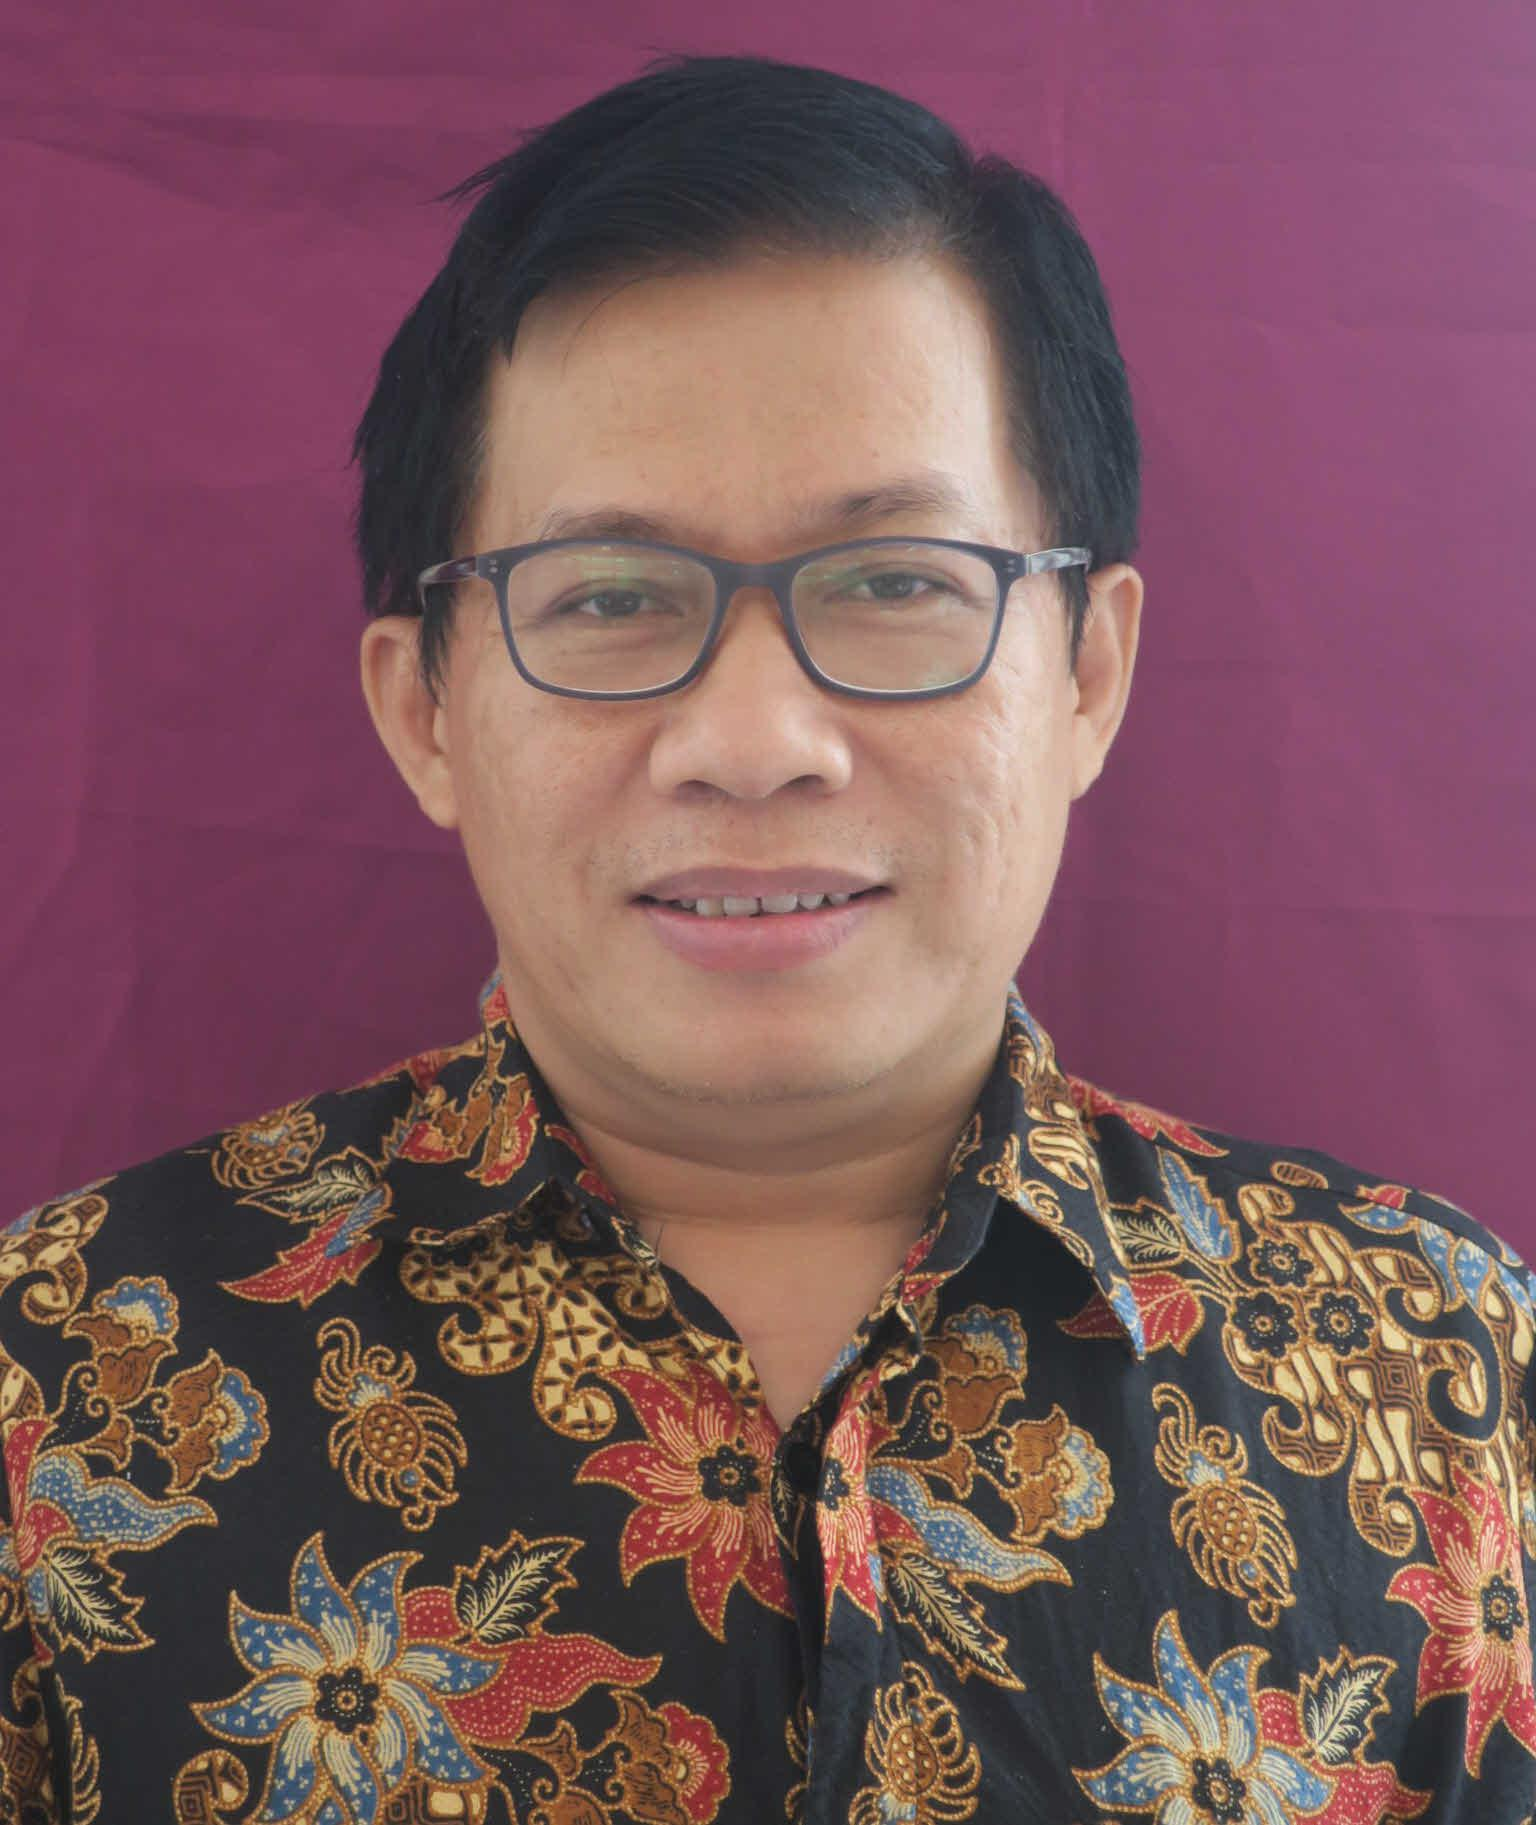 Dr. Iwan Supriyadi, S.T., M.Si.